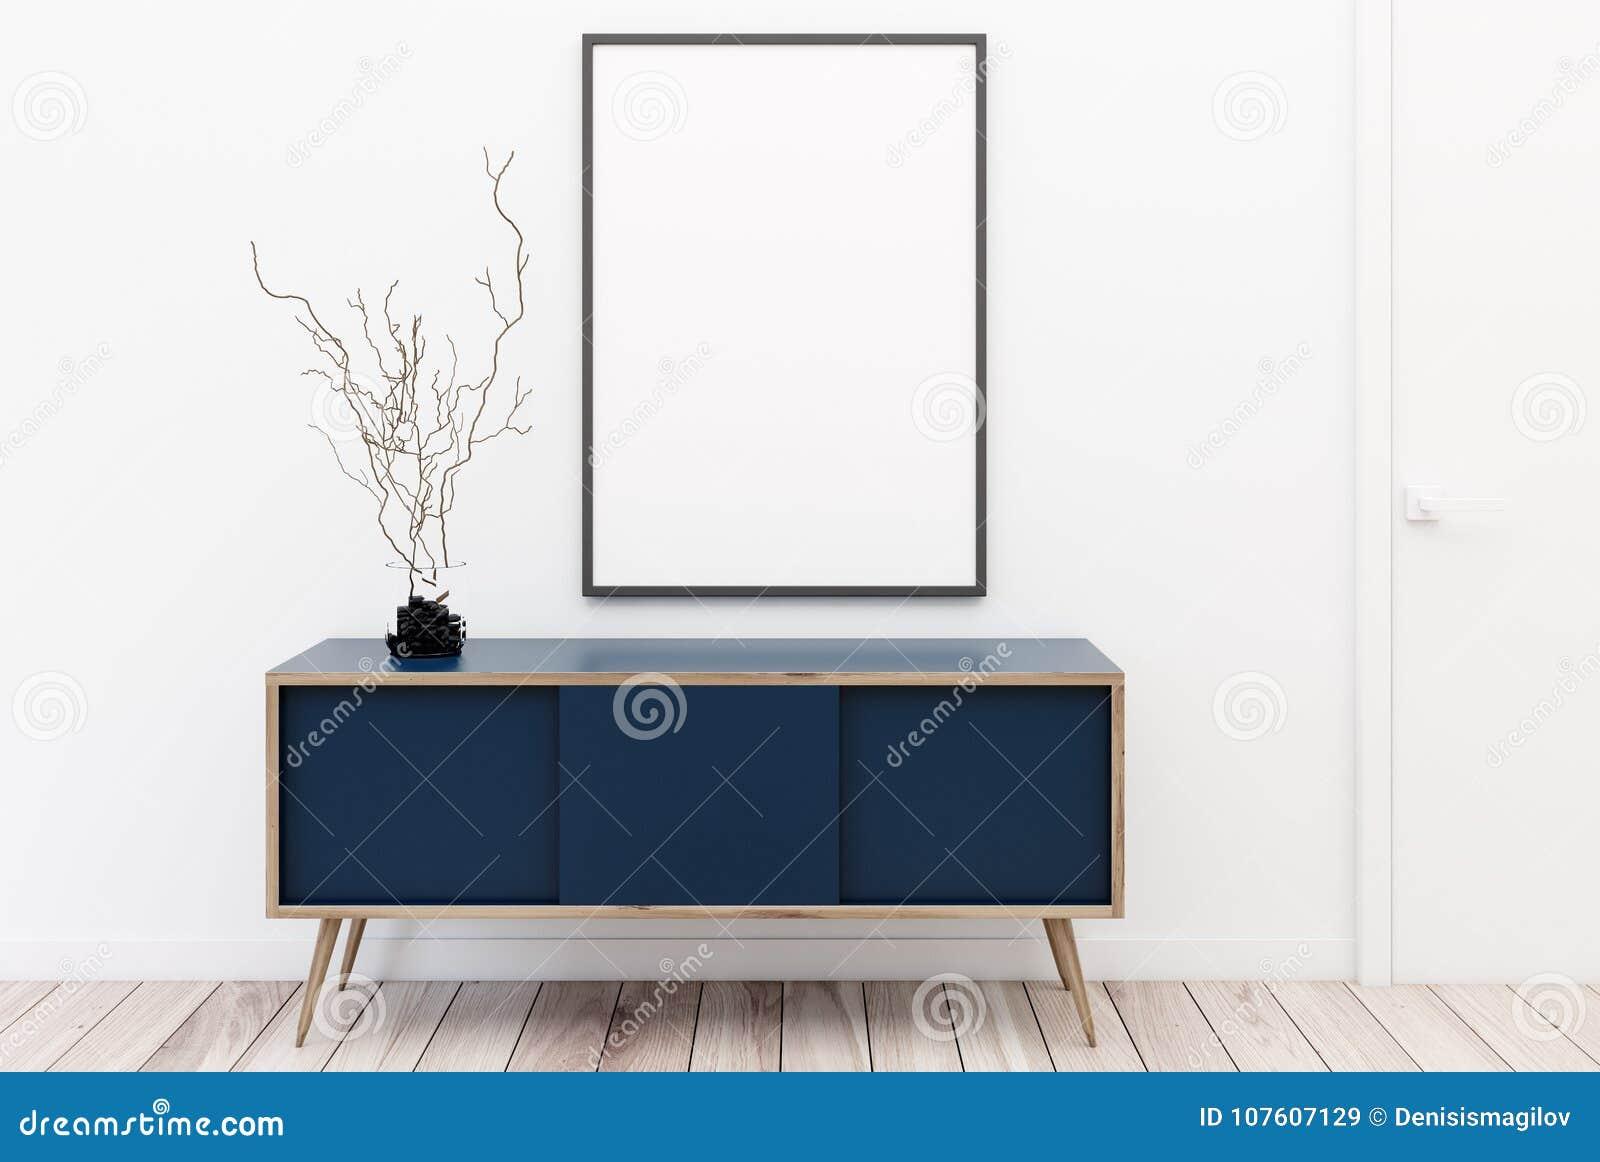 Blue Chest Of Drawers, Poster, White Stock Illustration ...